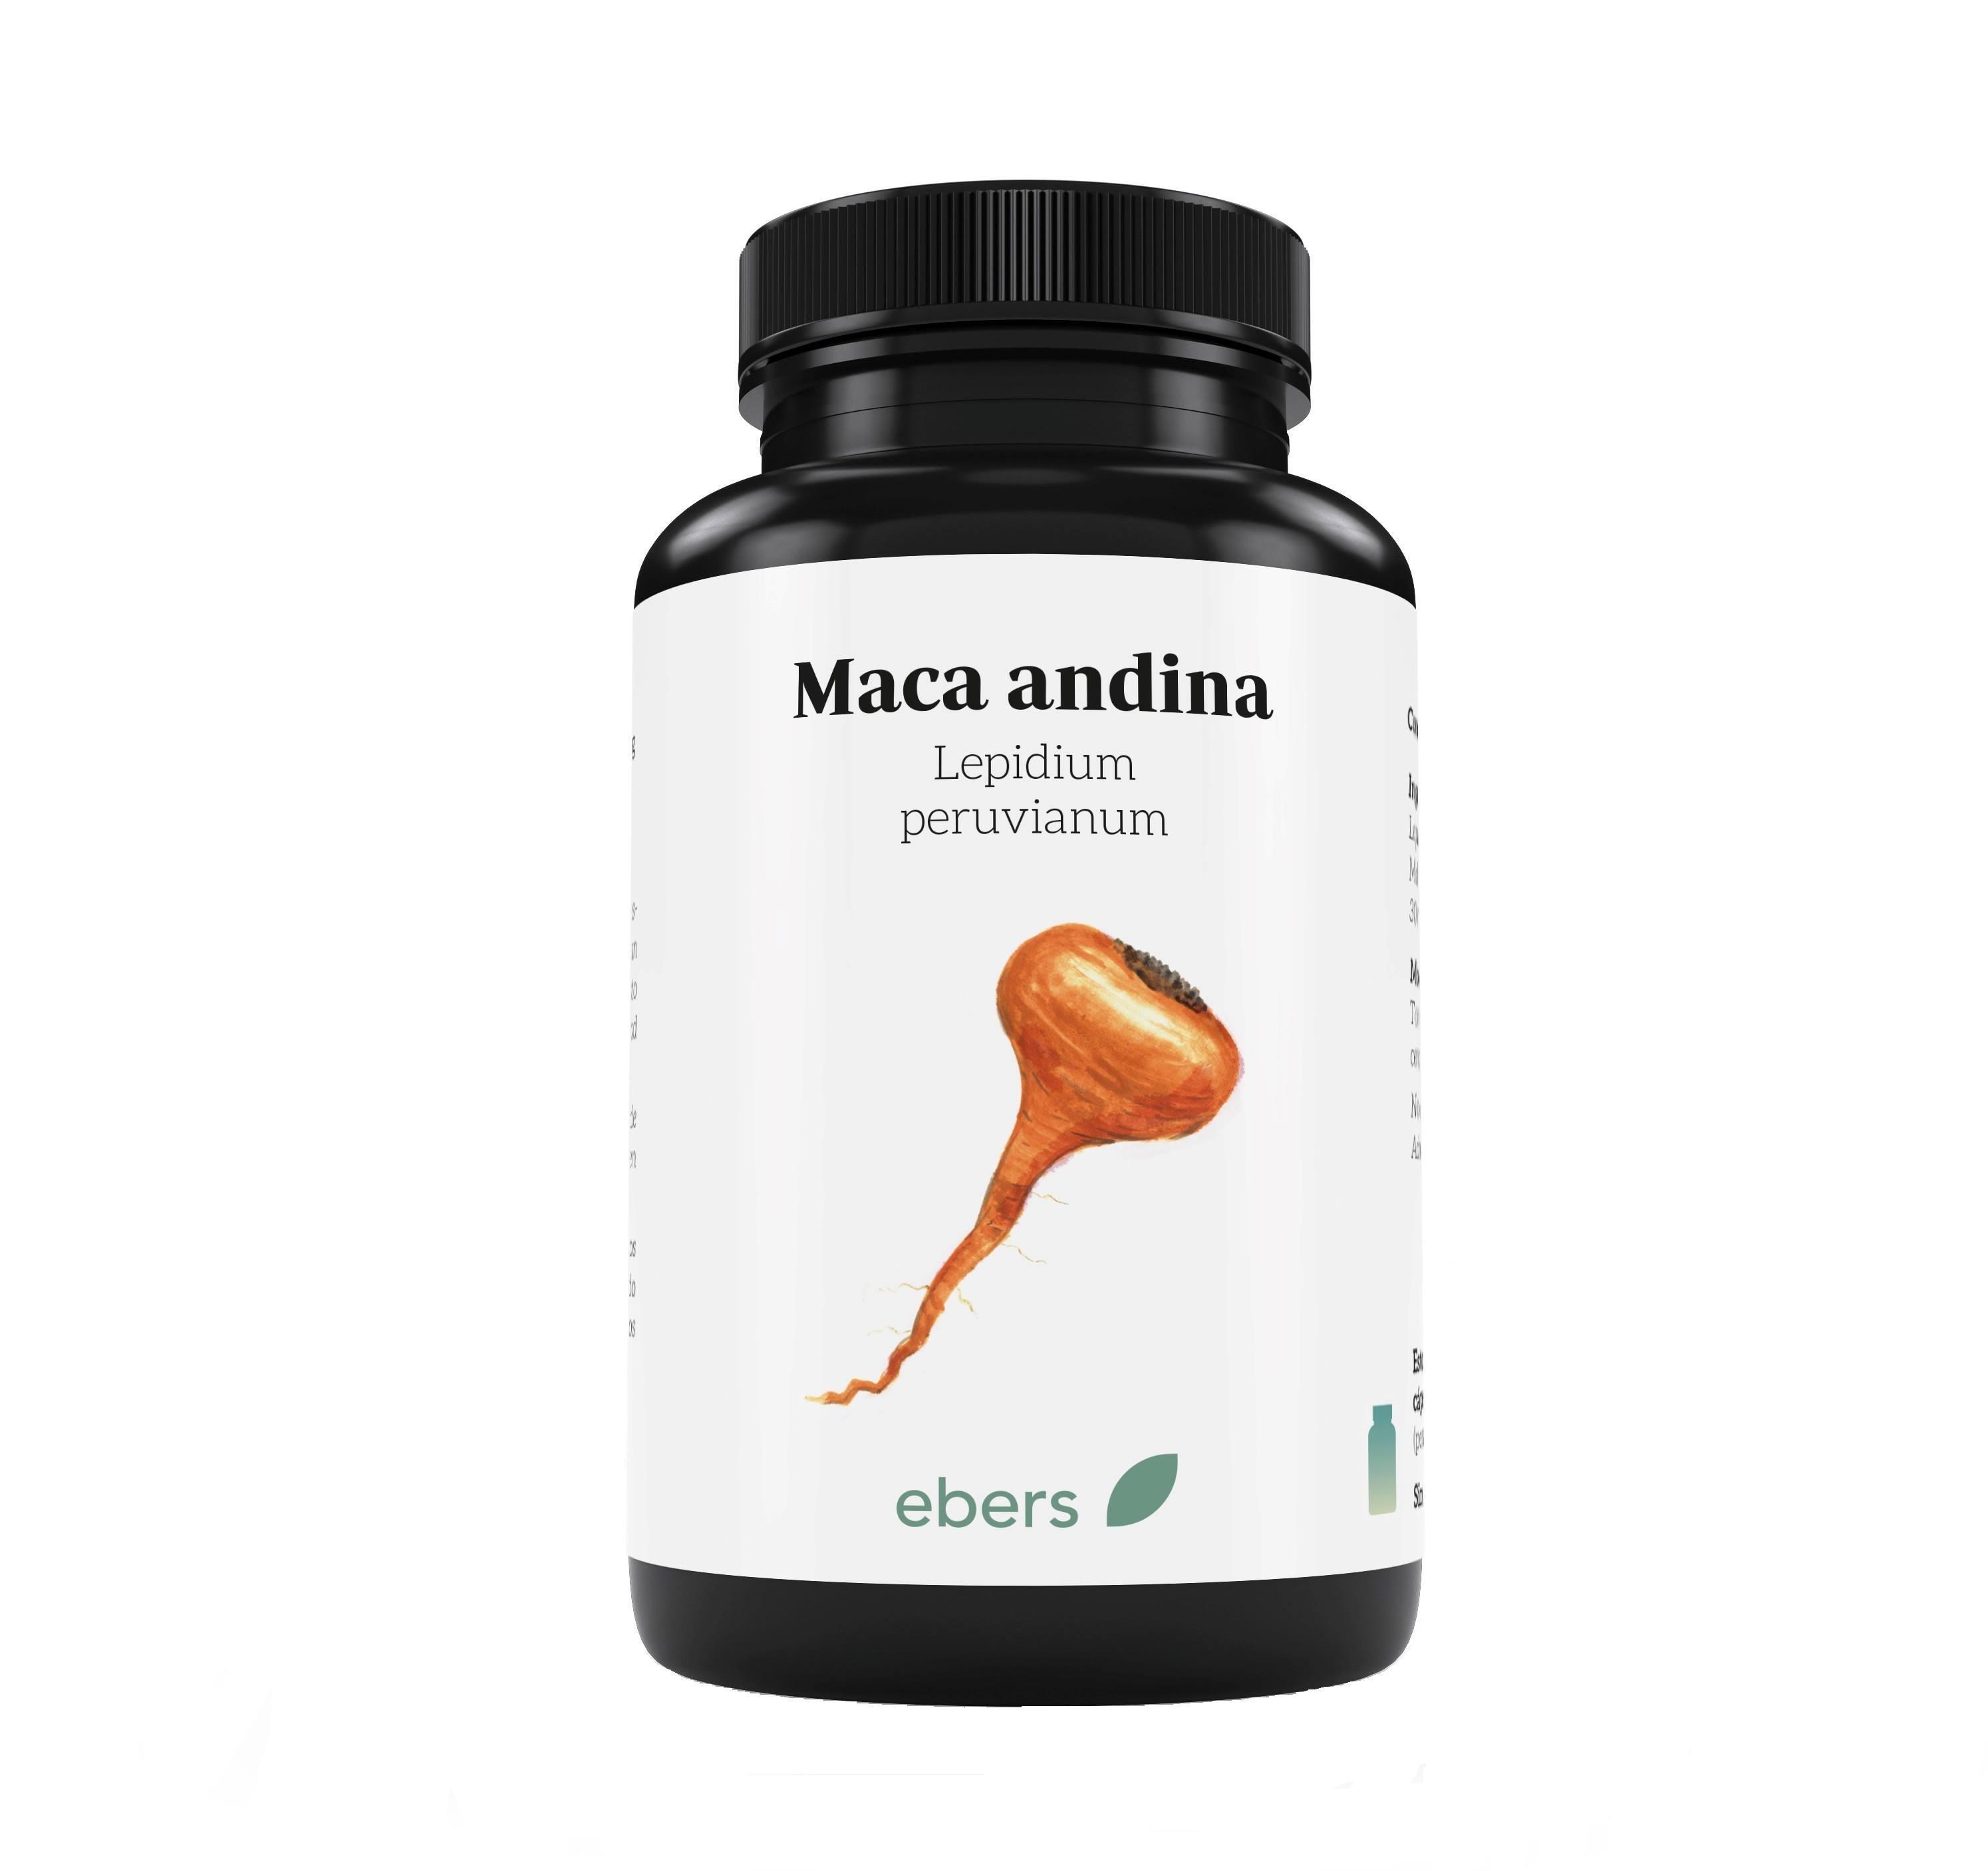 MACA ANDINA 60CAPS 500MG EBERS en Biovegalia